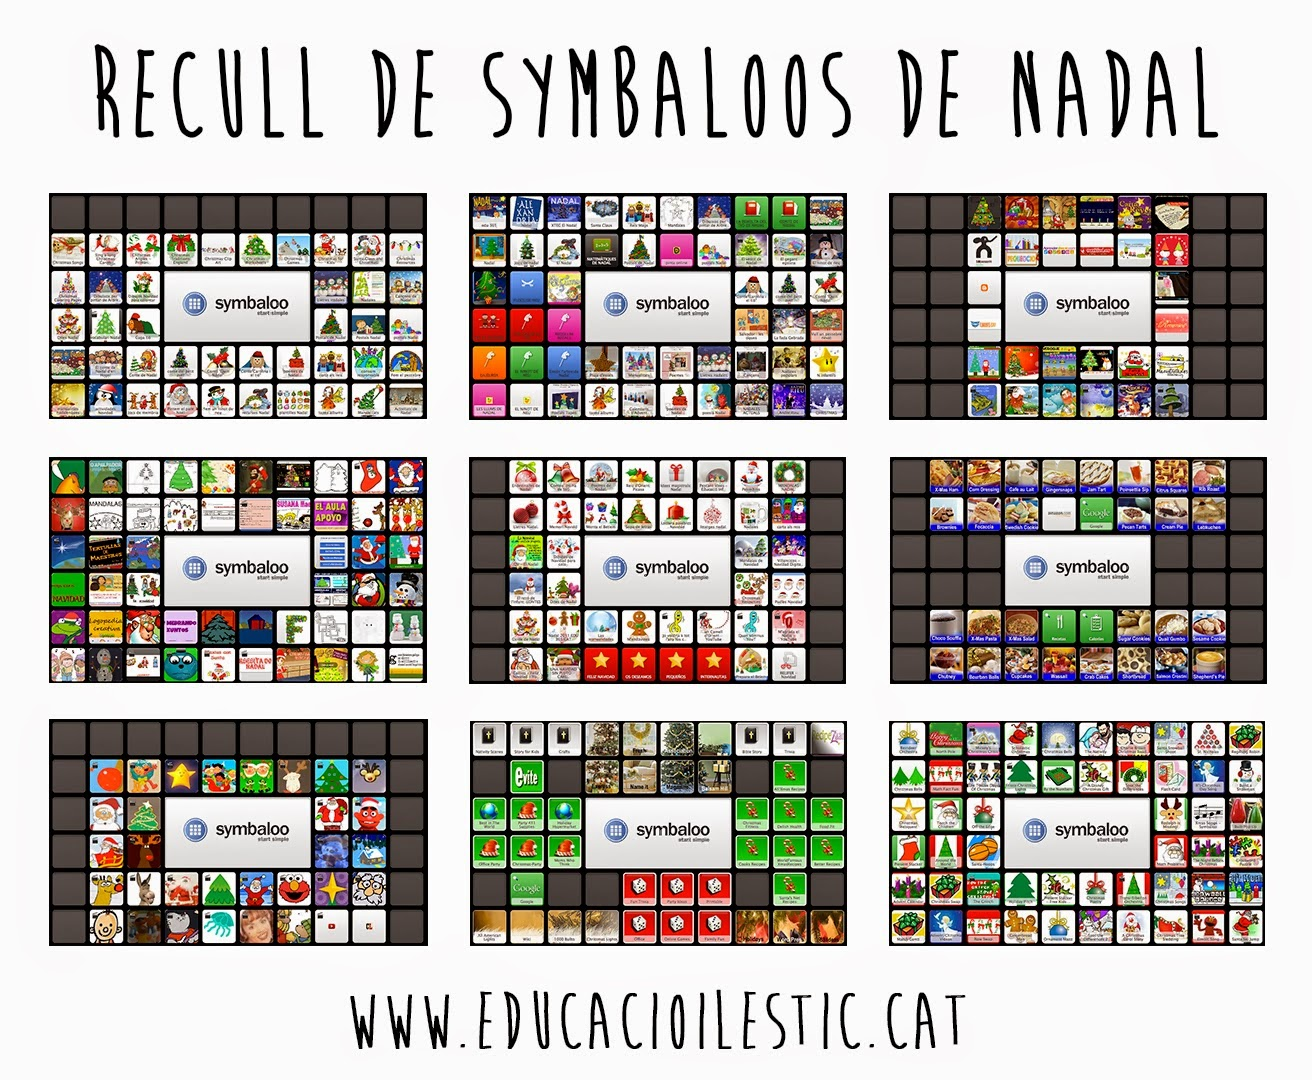 http://www.educacioilestic.cat/2013/11/recull-de-symbaloos-de-nadal.html